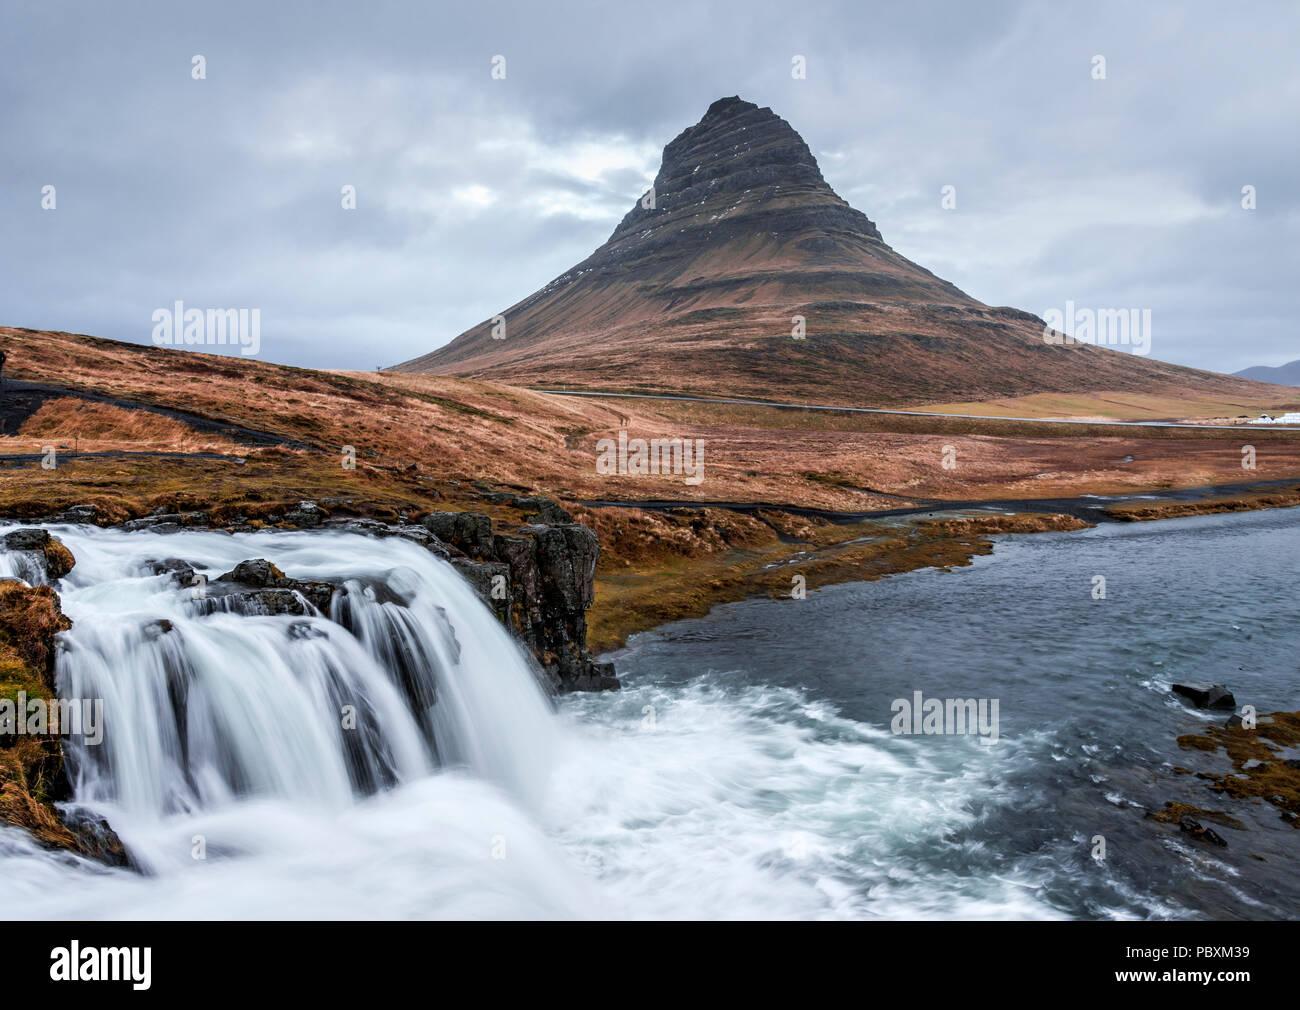 Kirkjufell mountain, Iceland, Europe - Stock Image